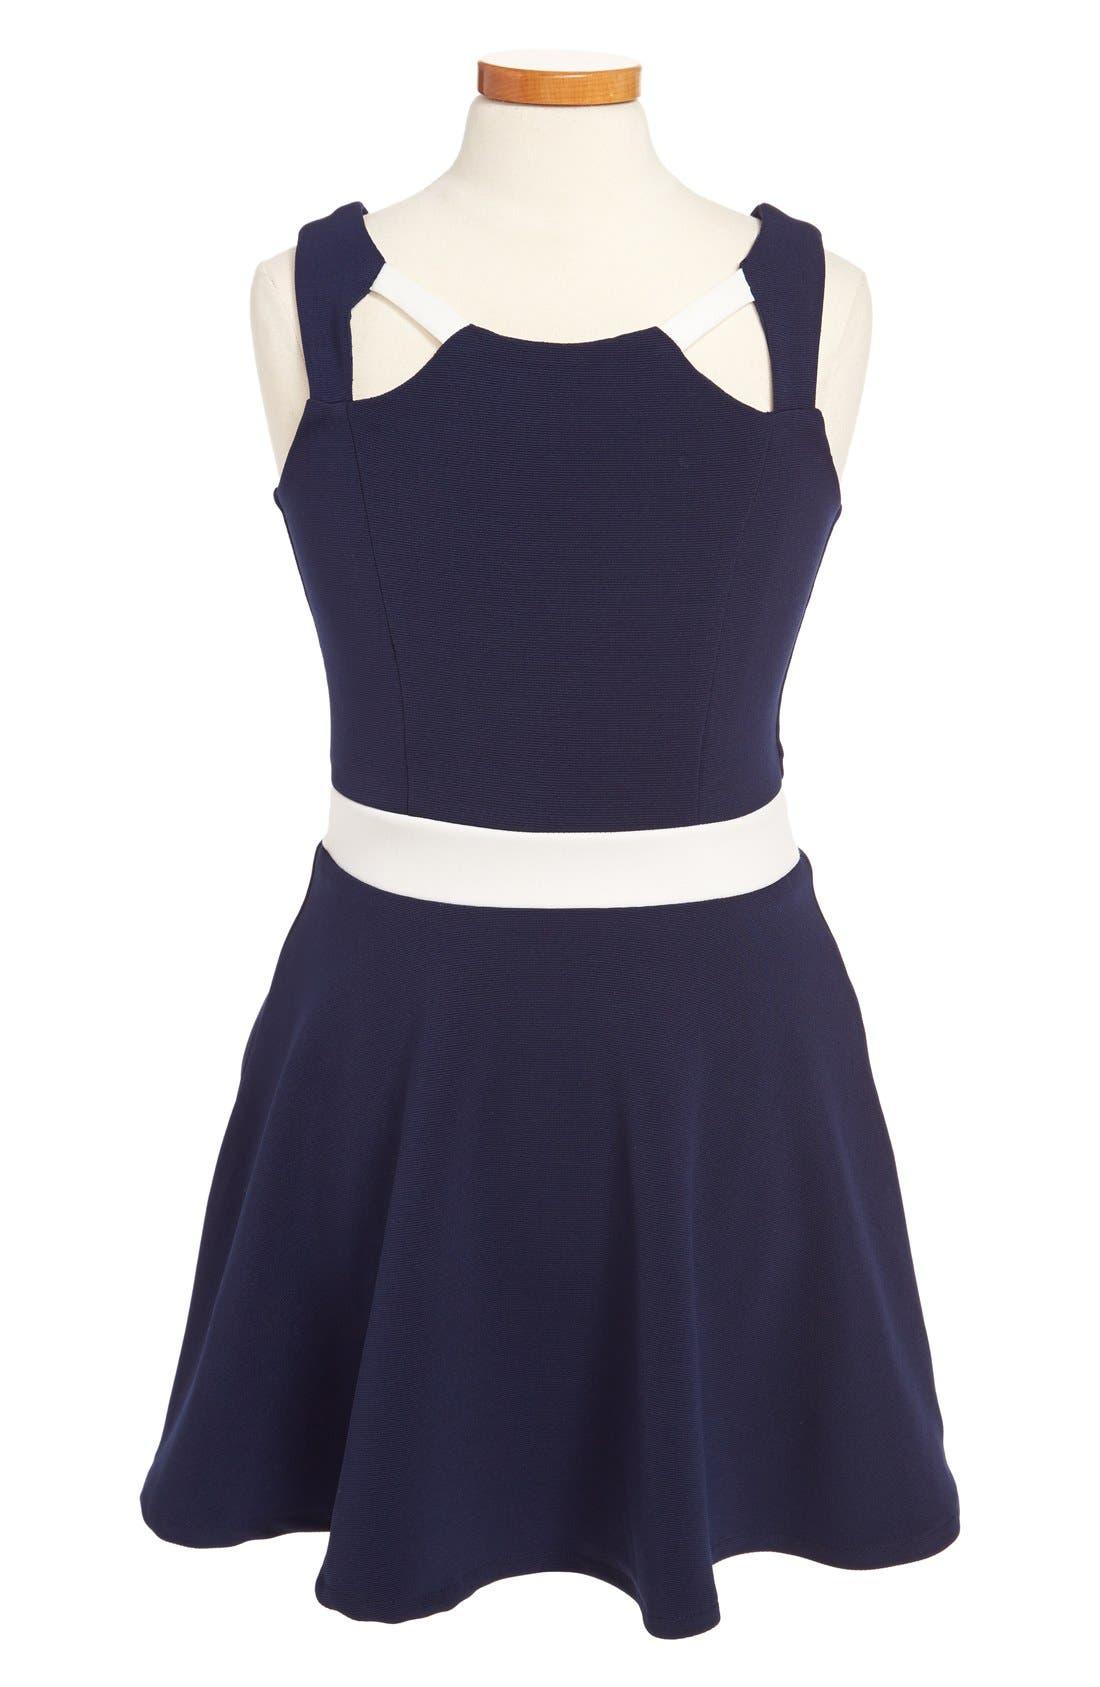 Alternate Image 1 Selected - Sally Miller 'The Annapolis' Dress (Big Girls)